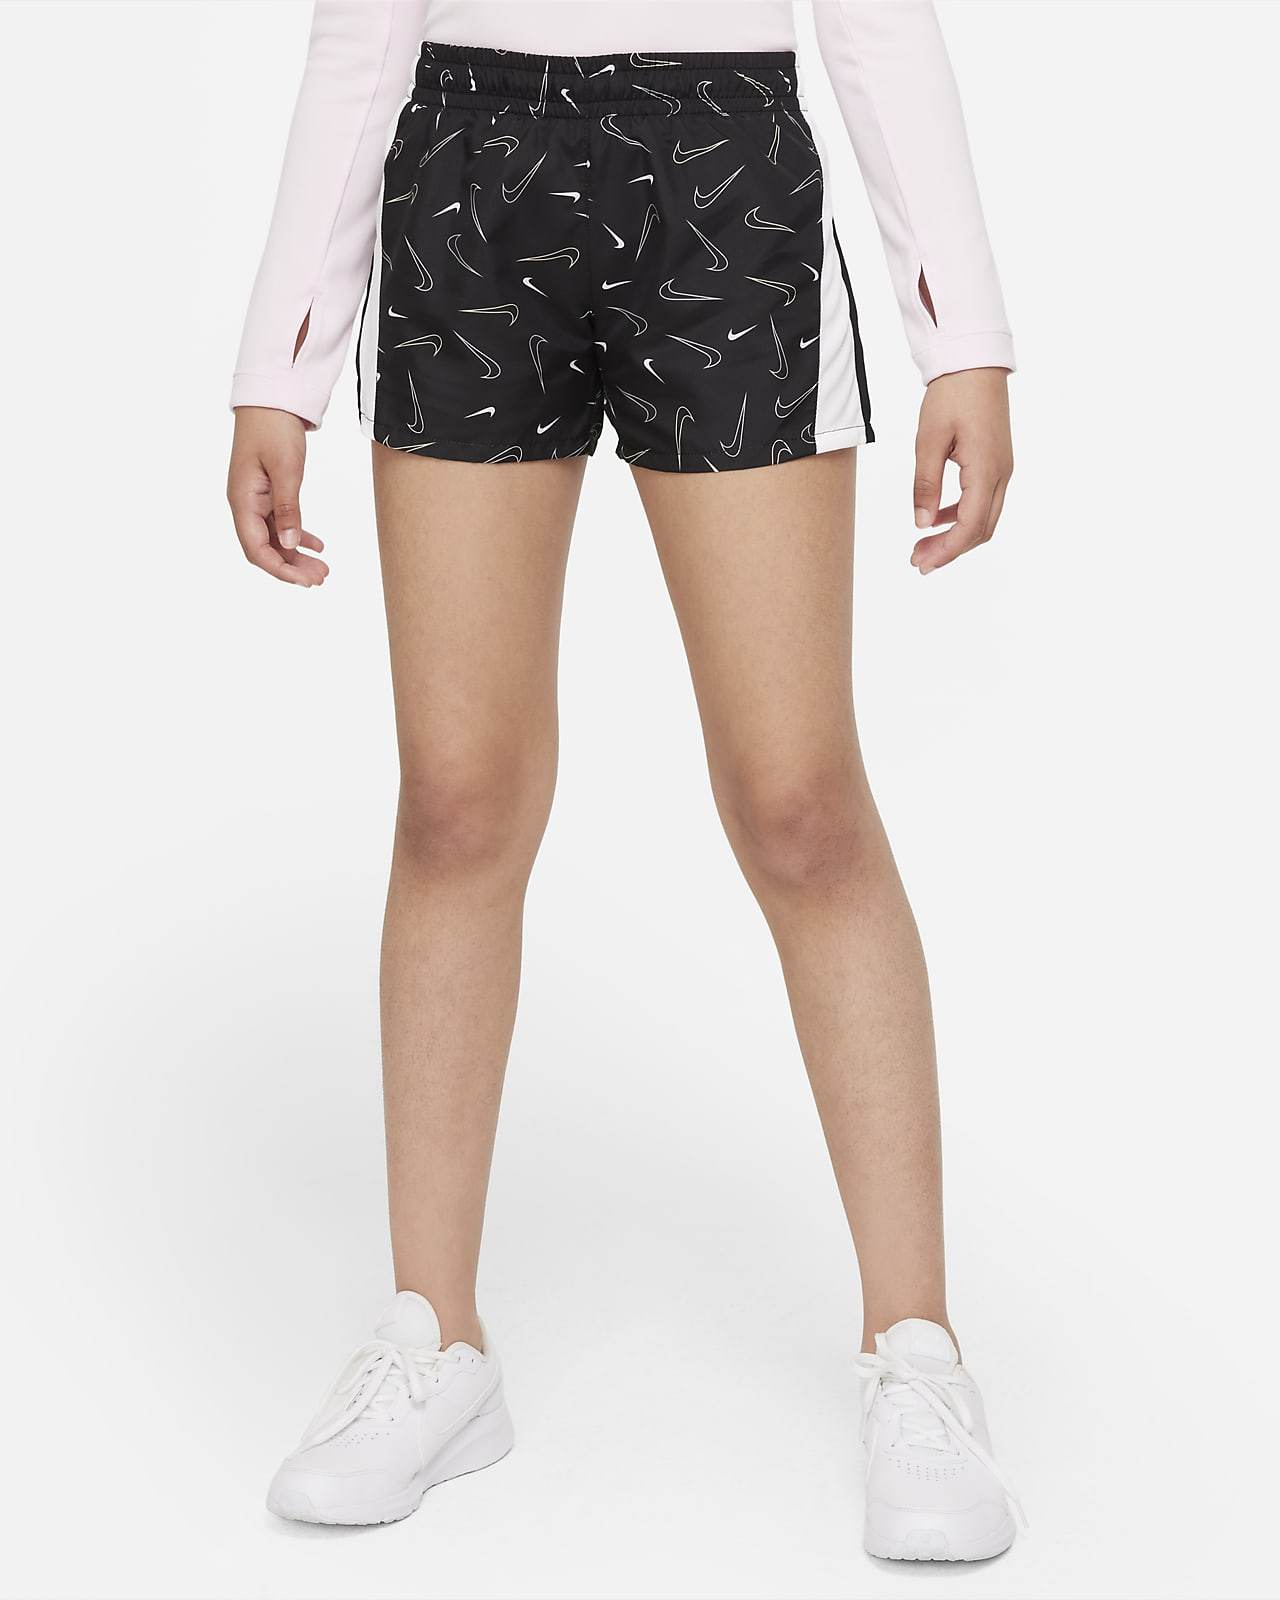 Nike Dri-FIT 10K2 Pantalón corto de running con estampado - Niña